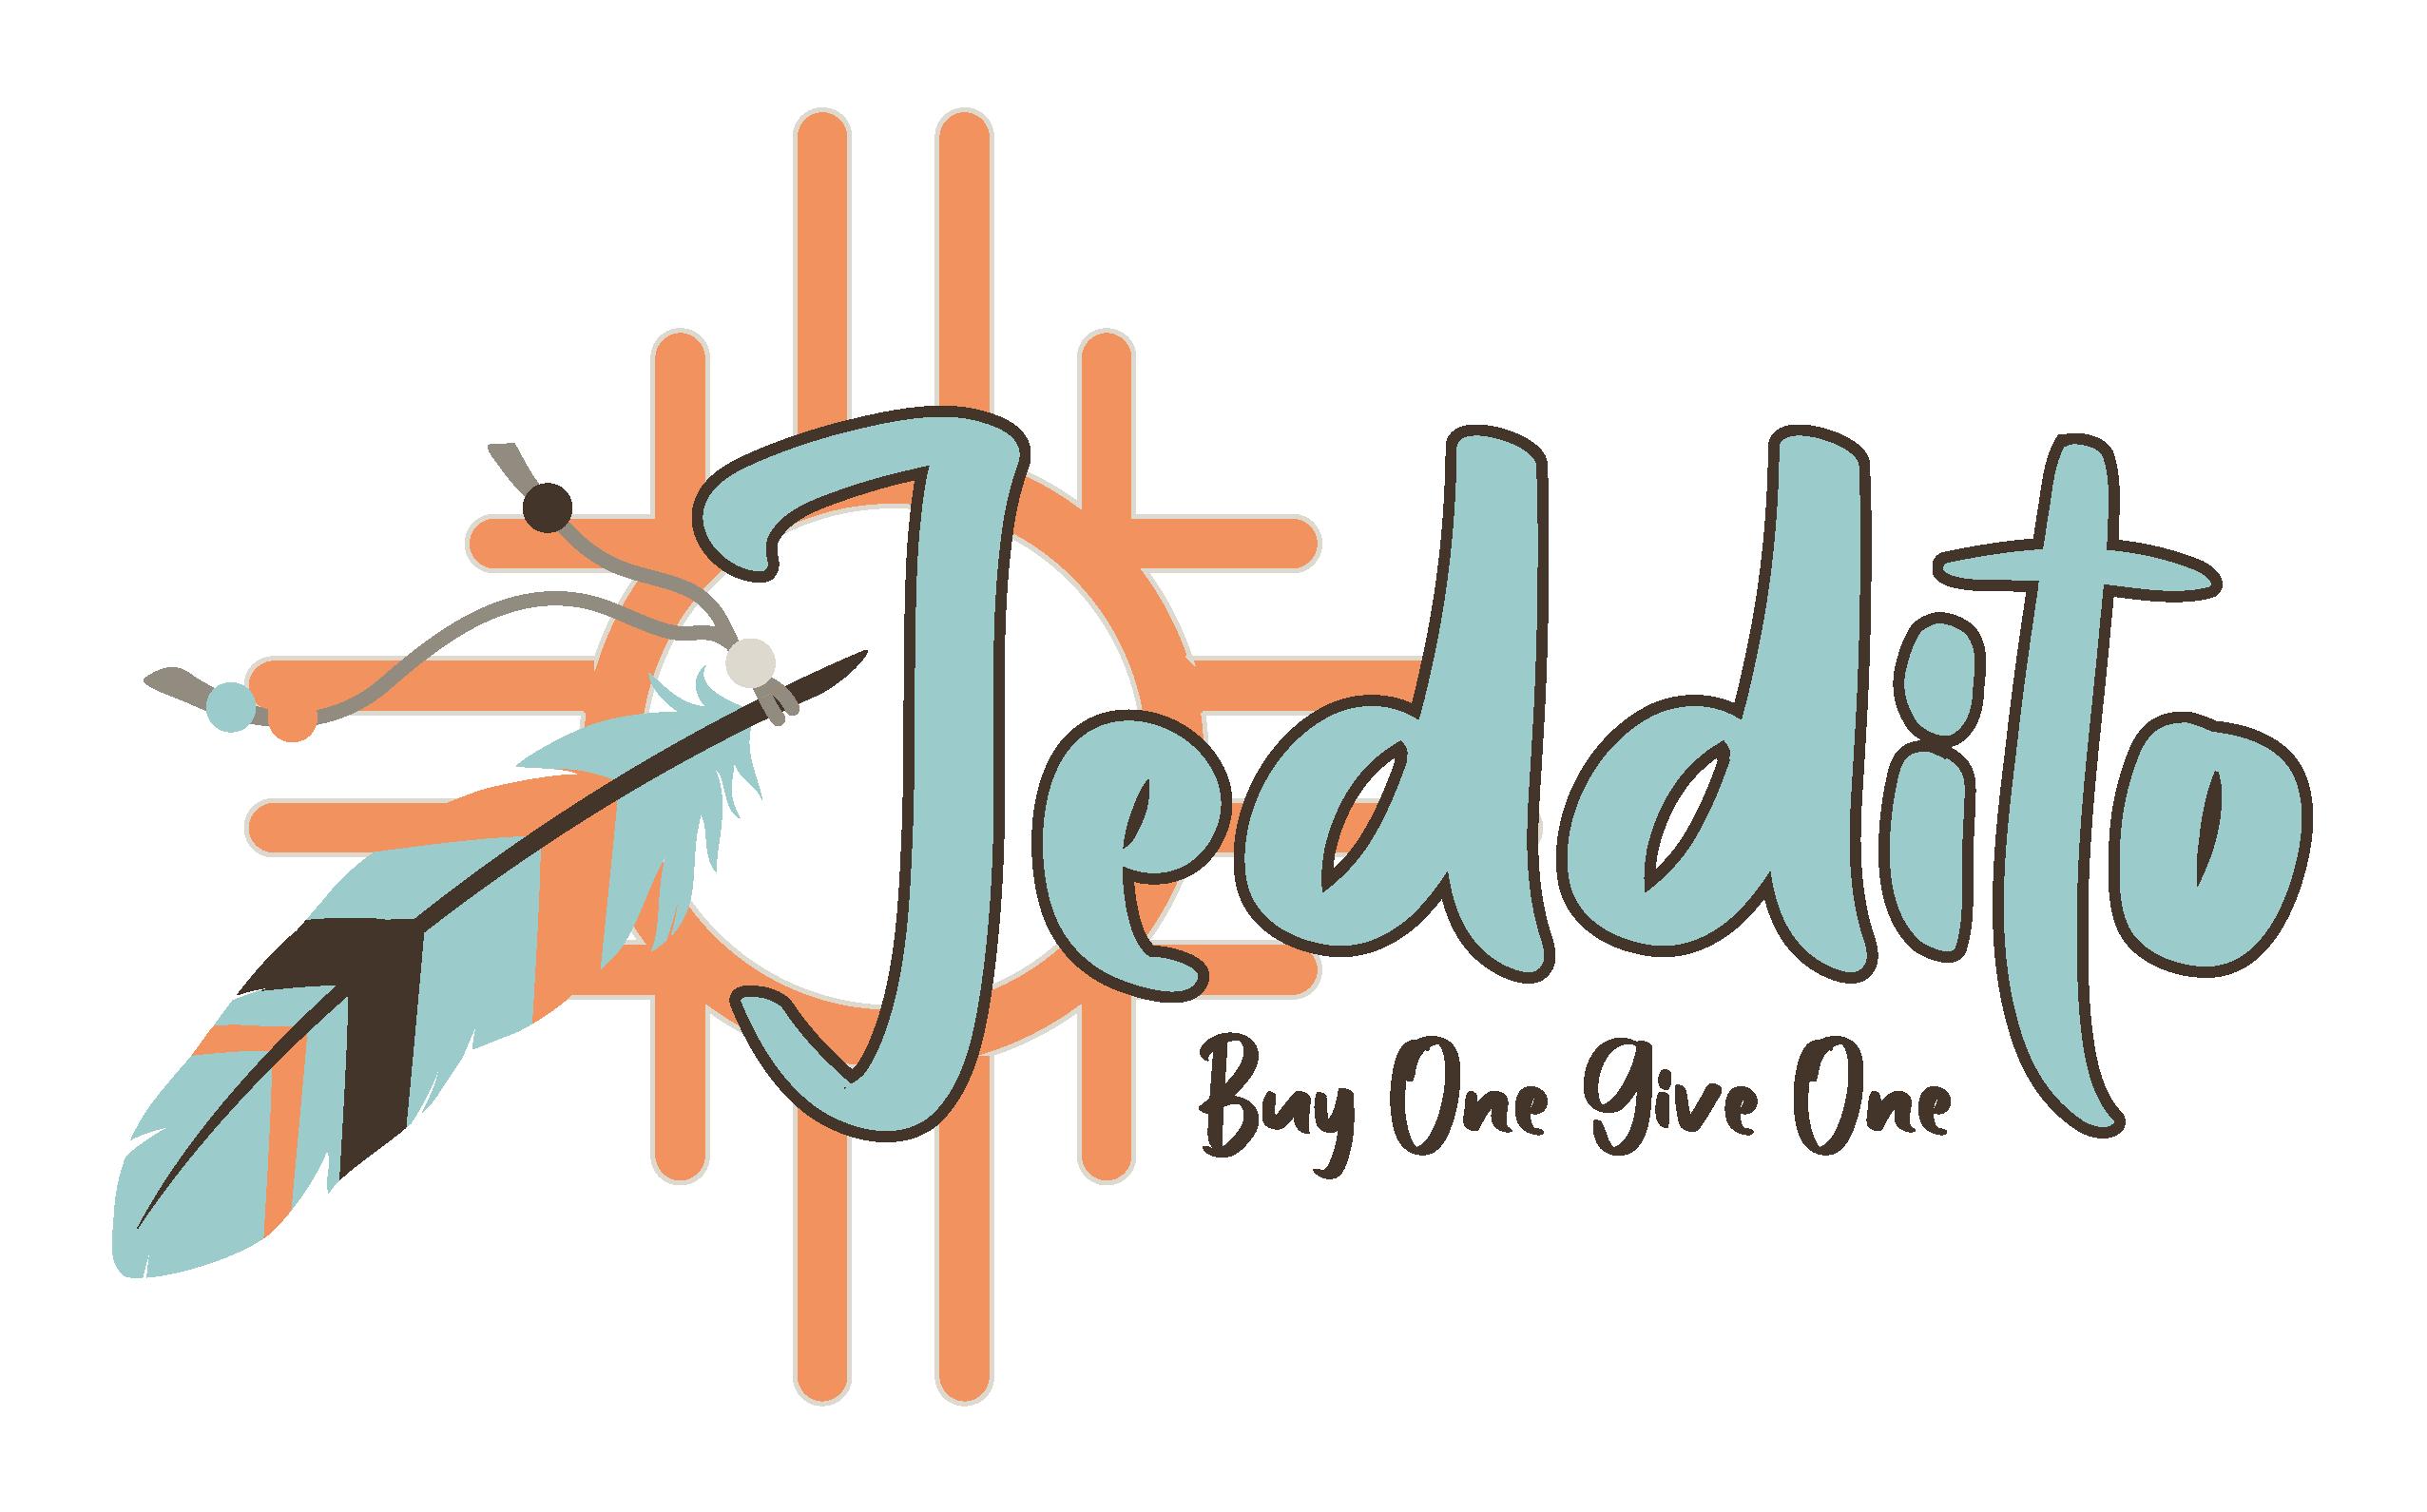 Jeddito